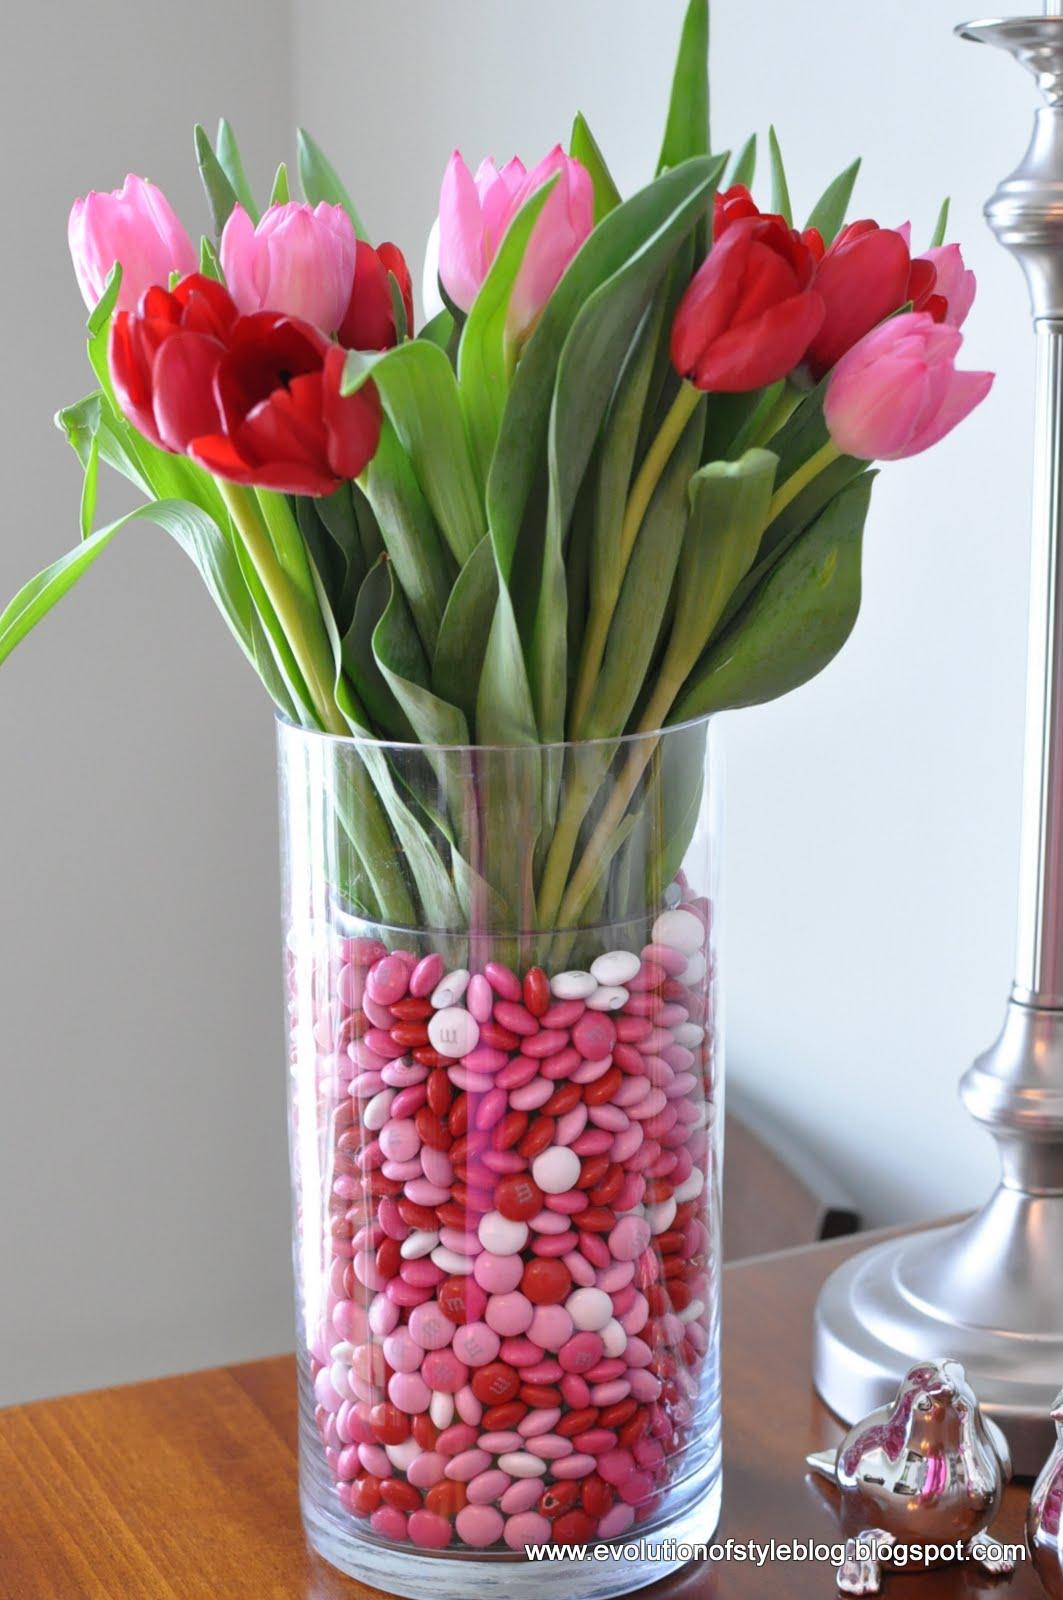 Valentines day gift idea valentines day gift ideas izmirmasajfo